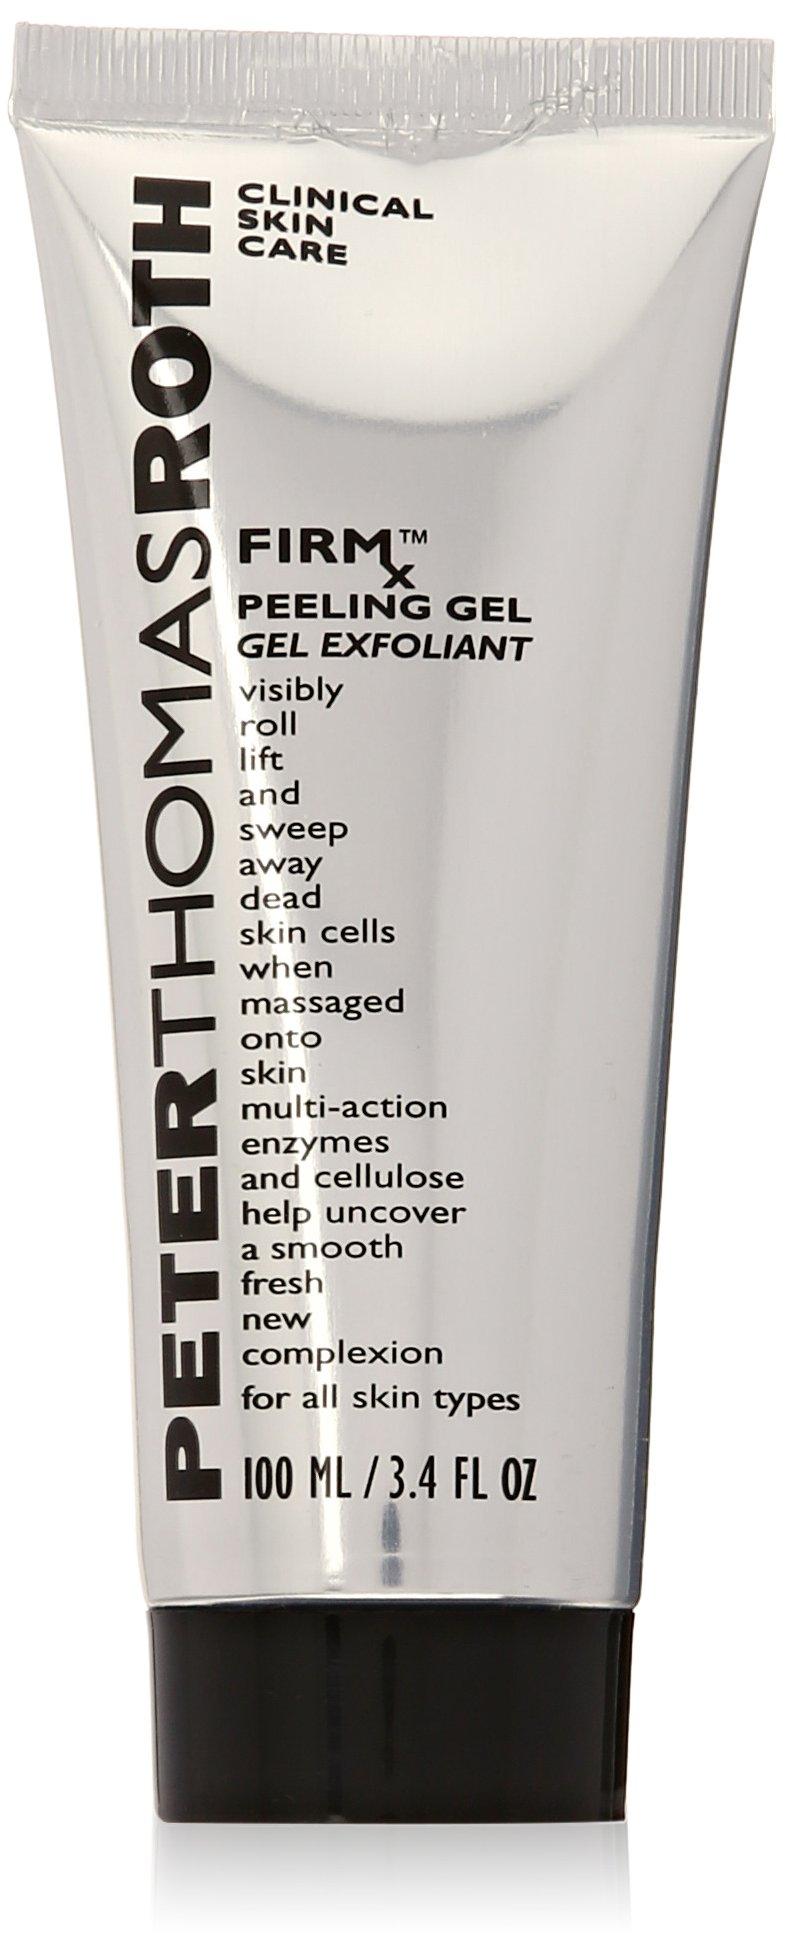 Peter Thomas Roth Firmx Peeling Gel, 3.4 Fluid Ounce